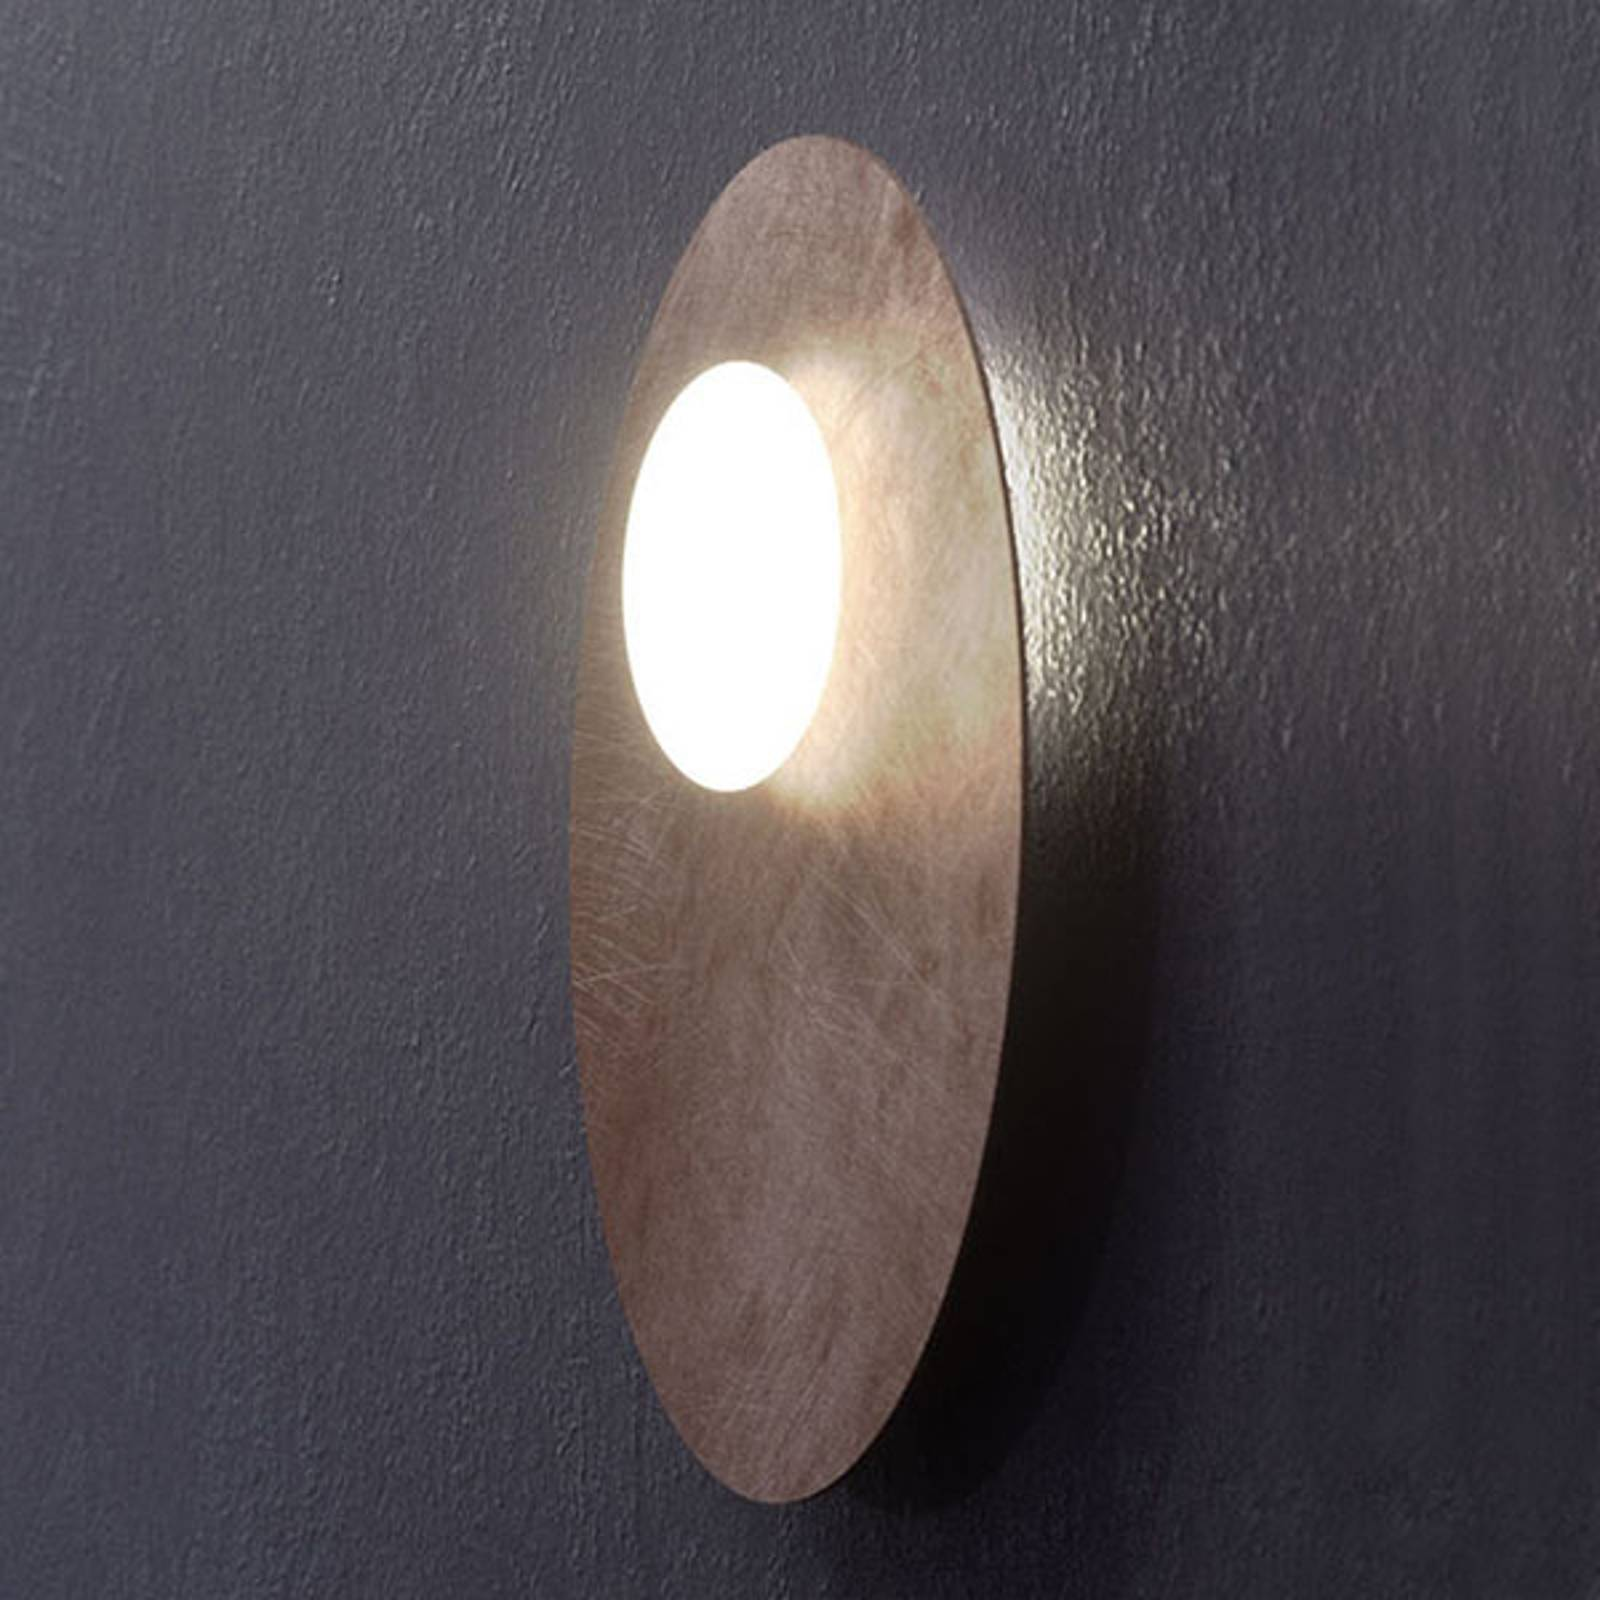 Axolight Kwic lampa sufitowa LED, brązowa Ø48cm